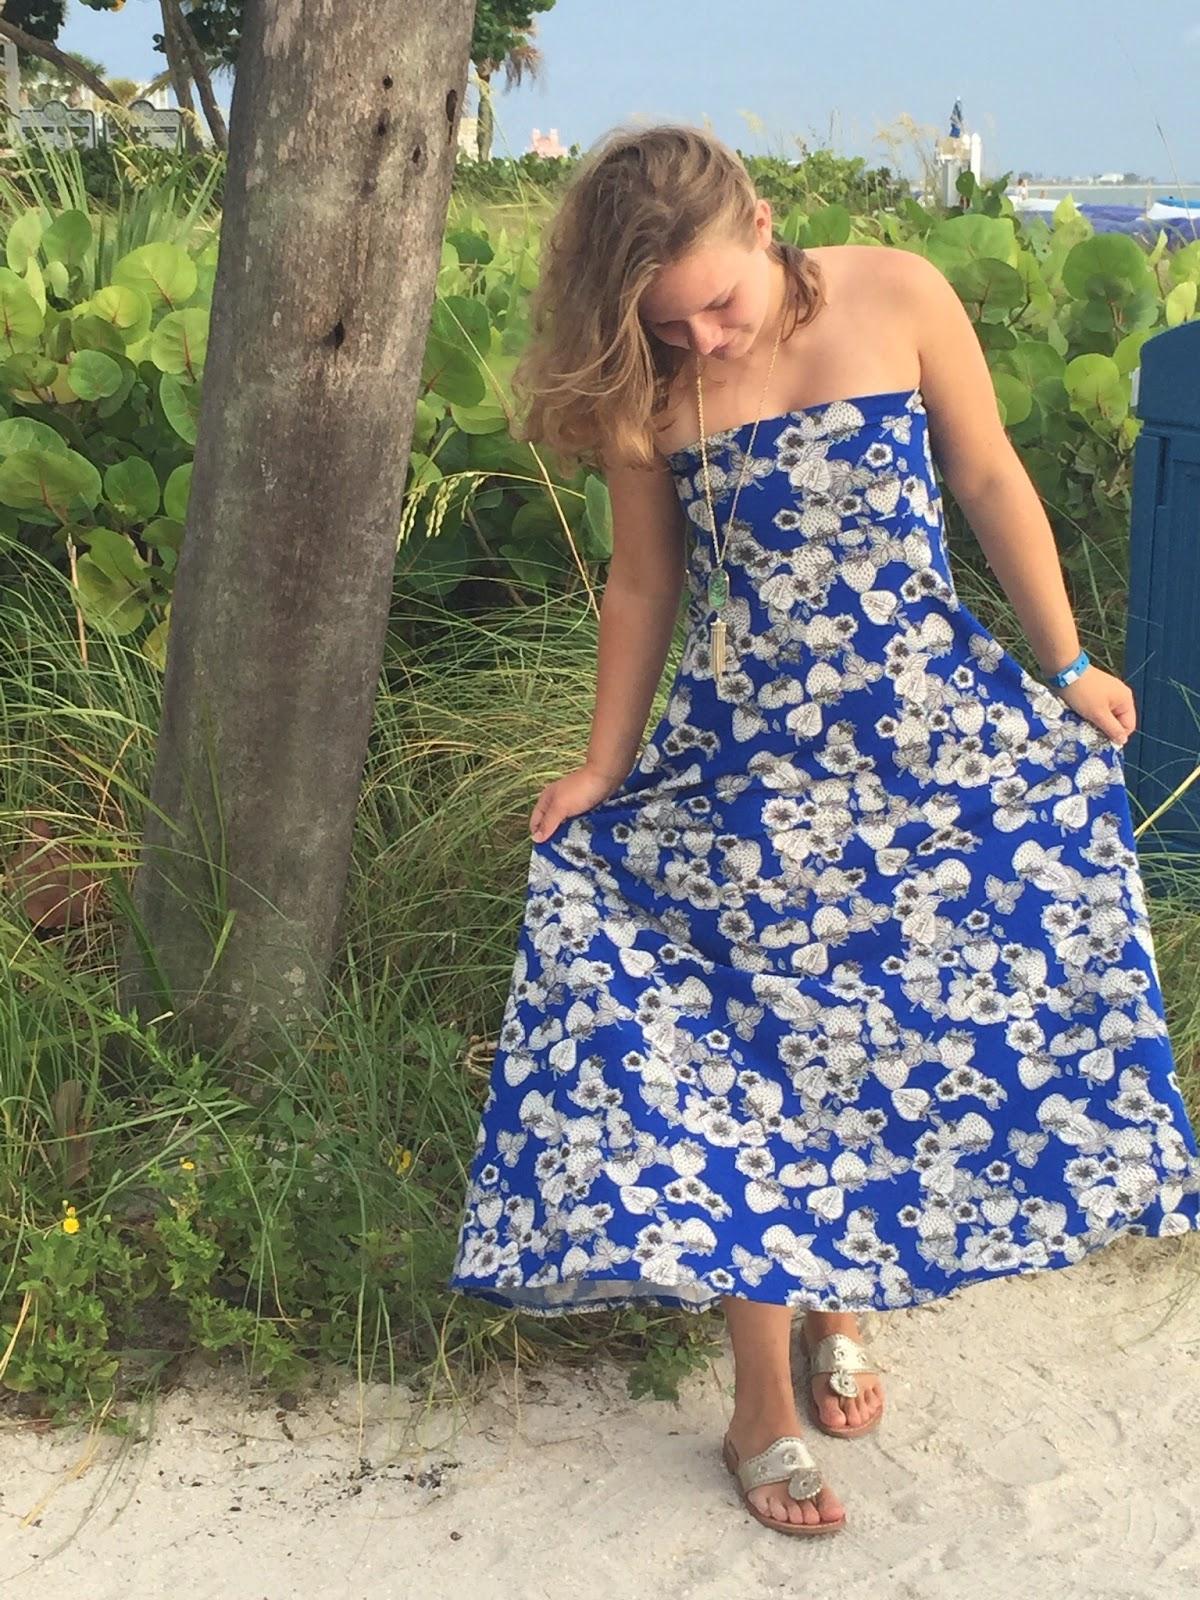 Lularoe maxi dresses